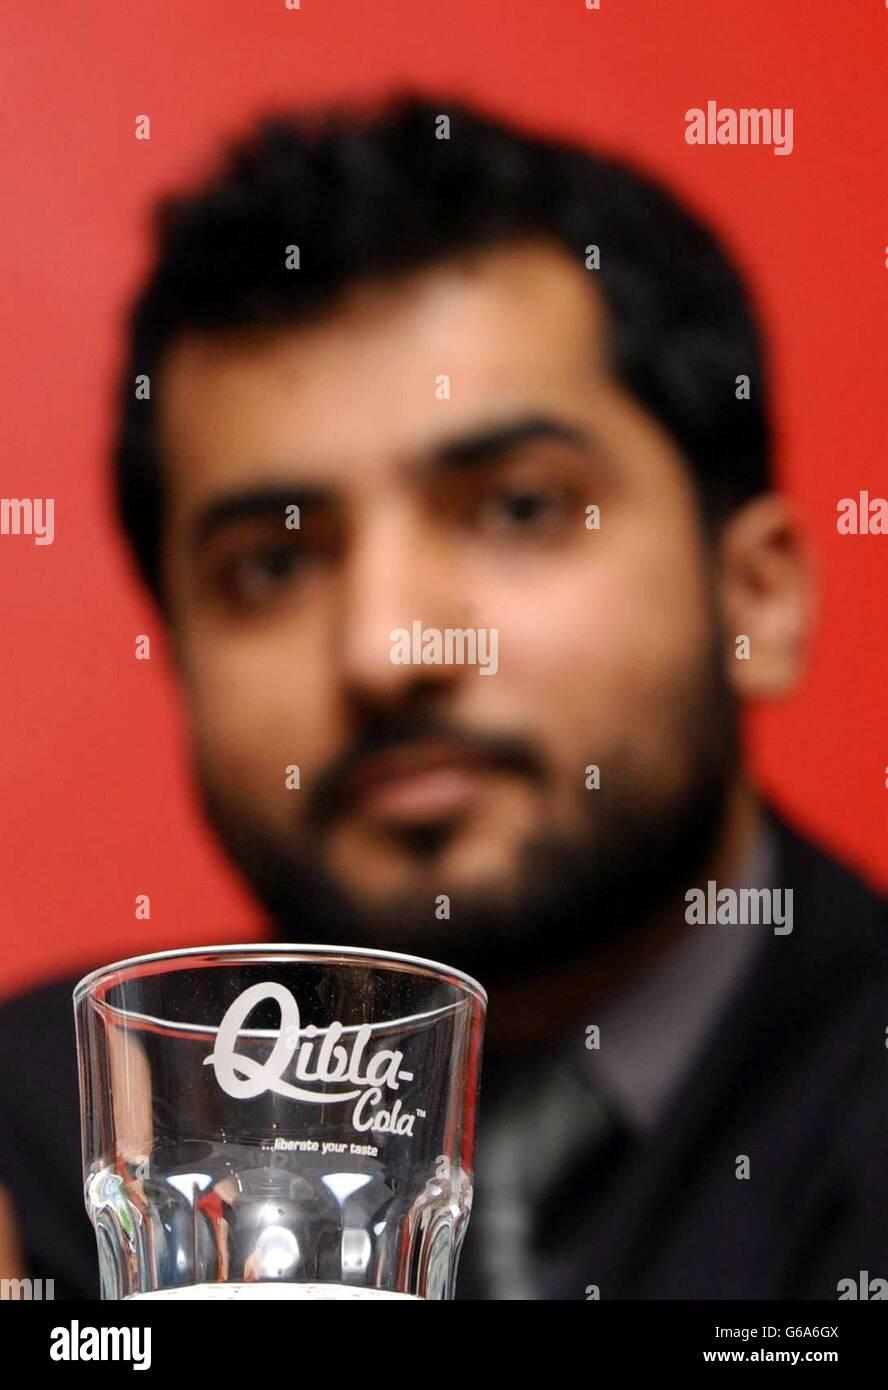 Qibla-Cola Company - Iqbal - Stock Image